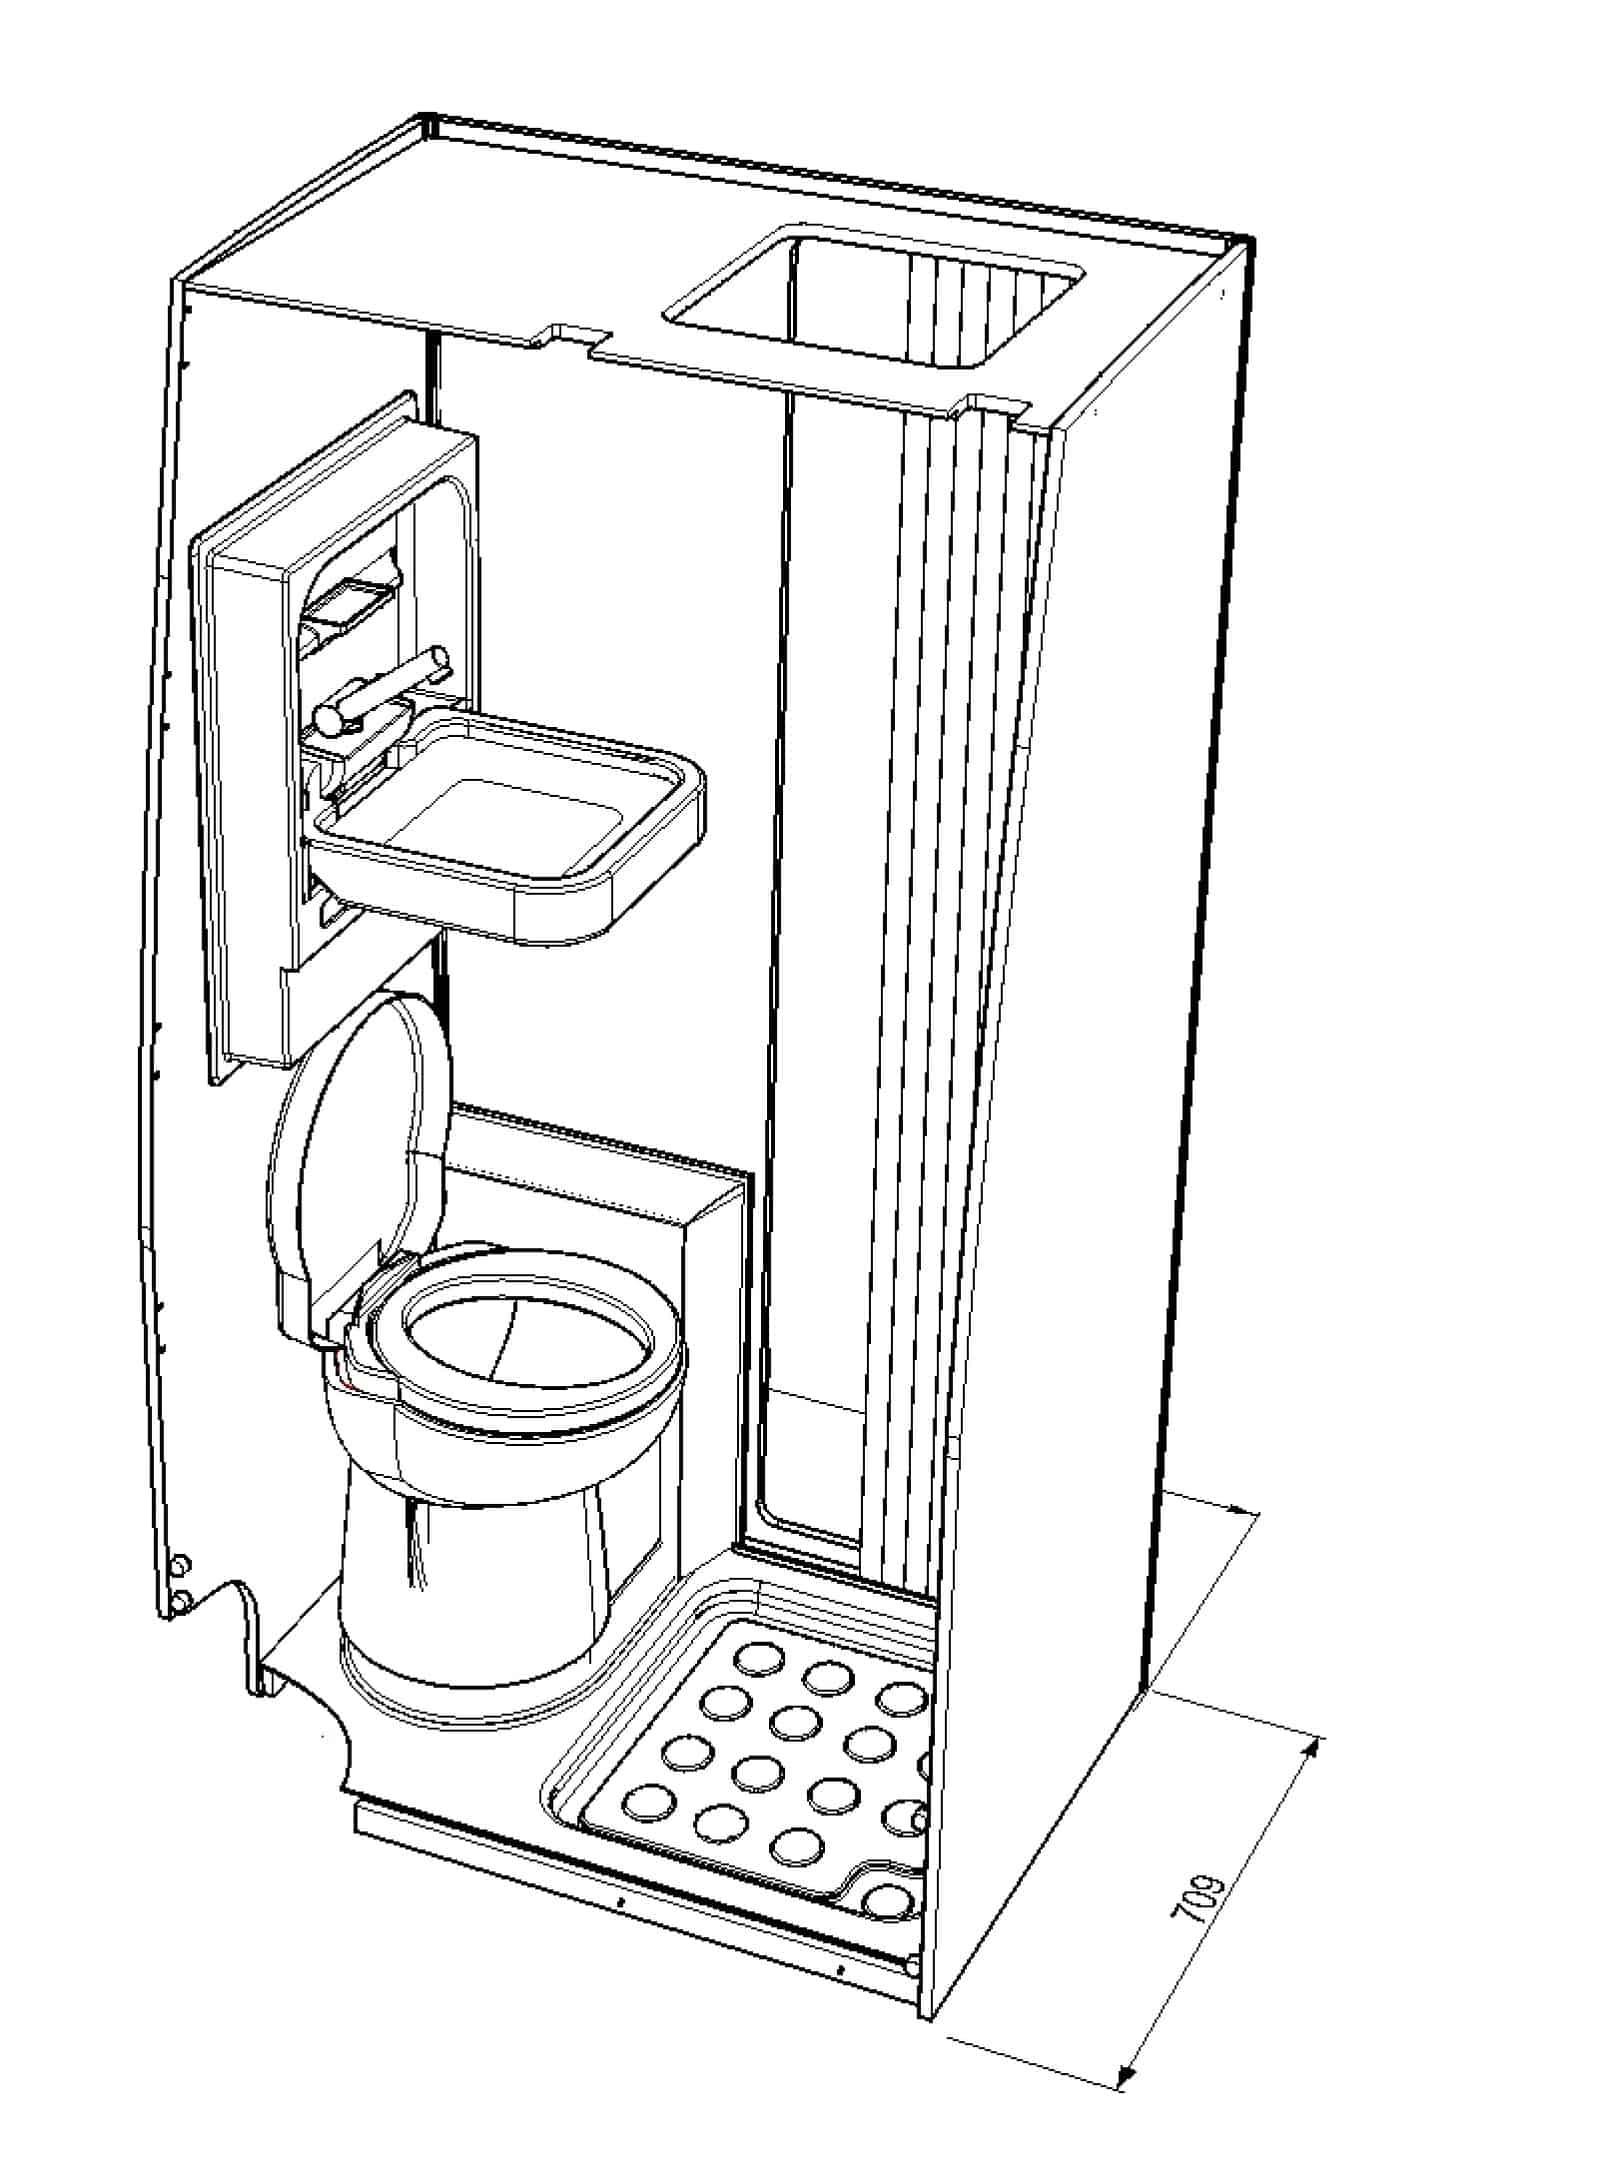 Shower toilet cubicle Crafter 2017 onwards standard & 4